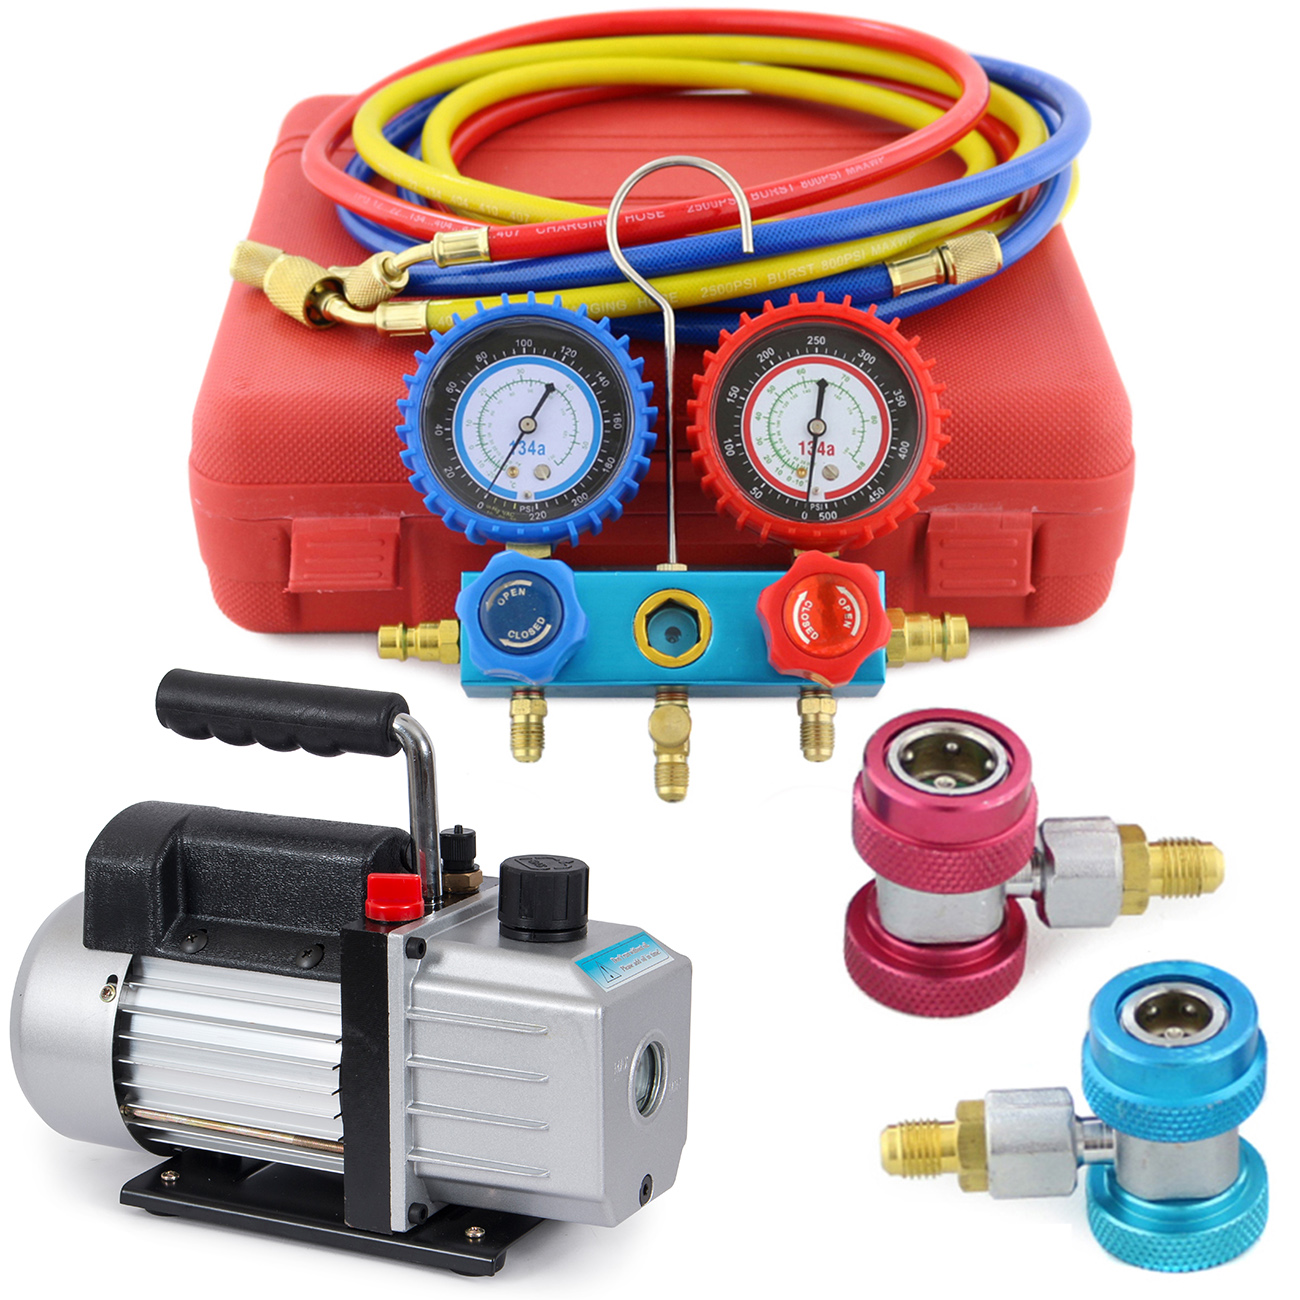 Arksen Vacuum Pump 4CFM, 1/3HP + Manifold Gauge Charging/Hose for R134a